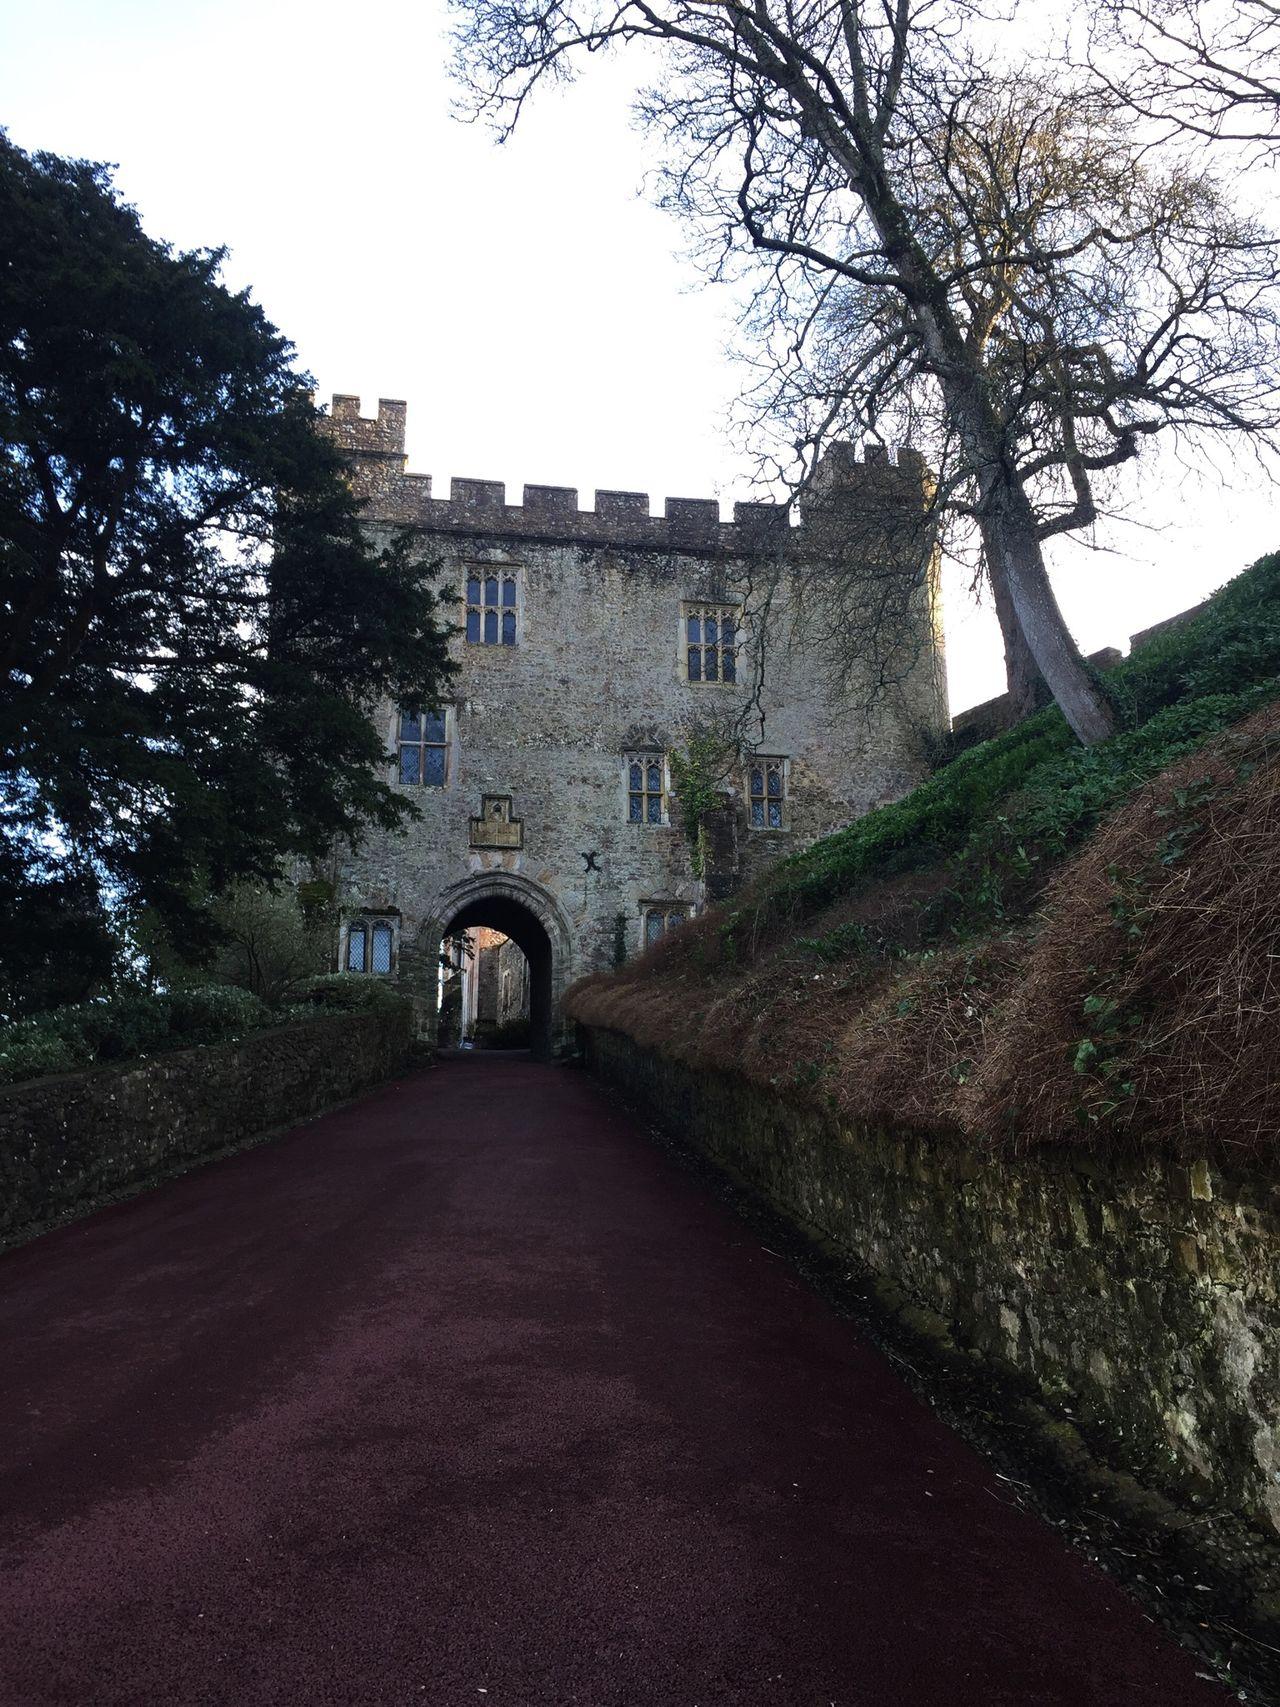 Dunster Castle Gate House